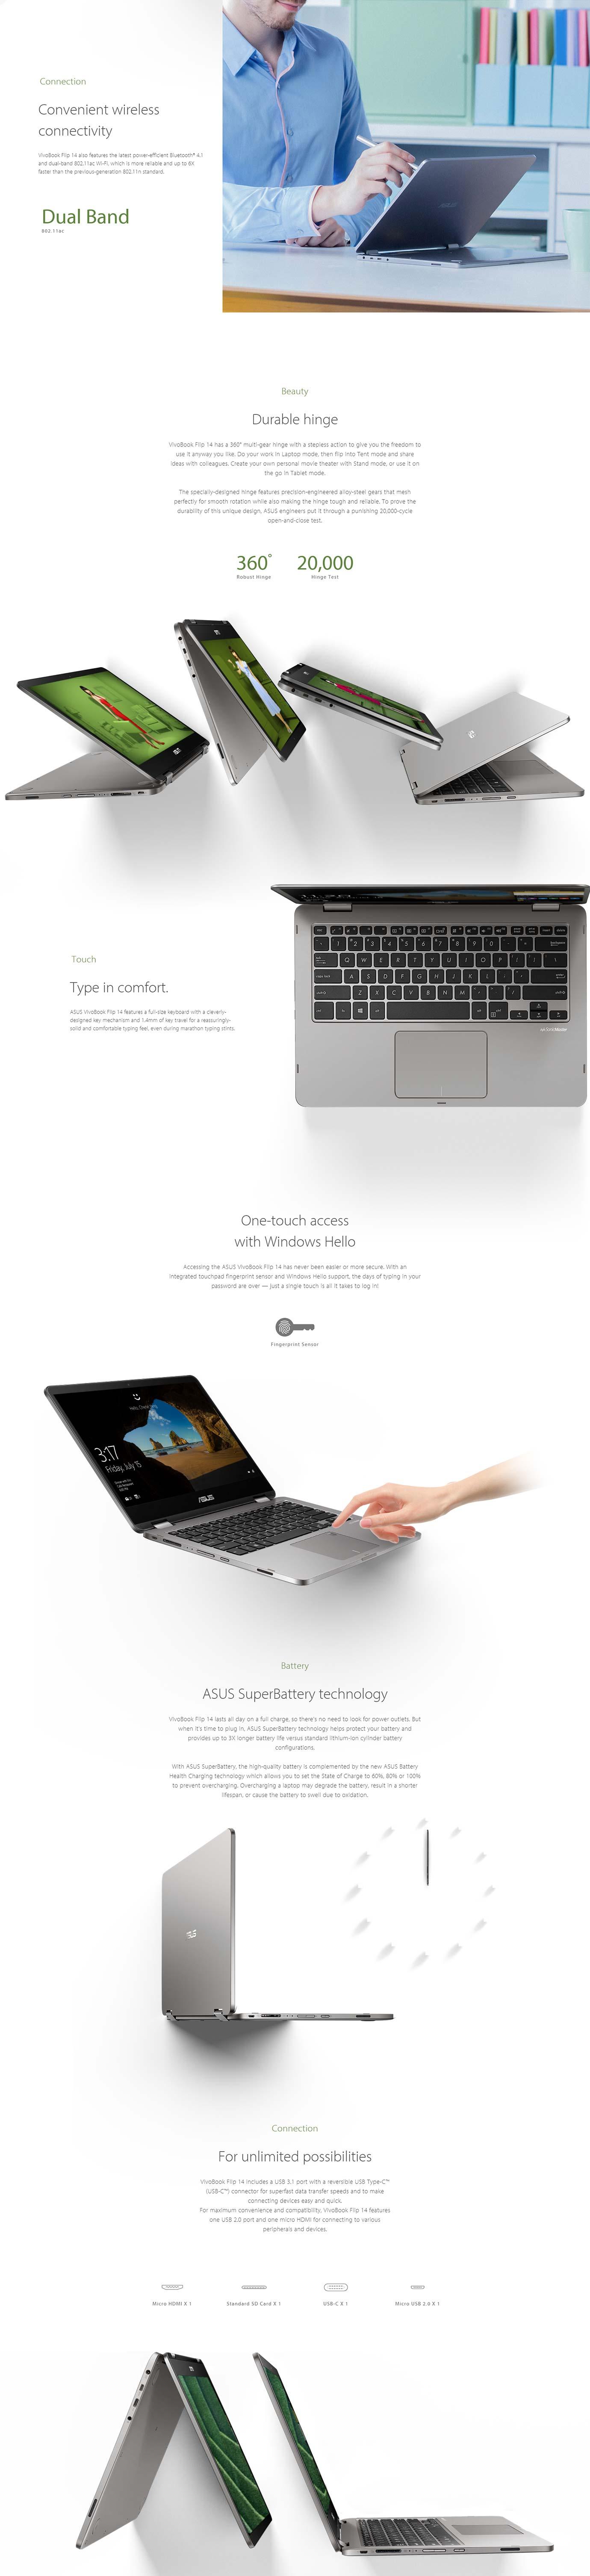 Asus Vivobook Flip TP401MA-BZ235R Laptop